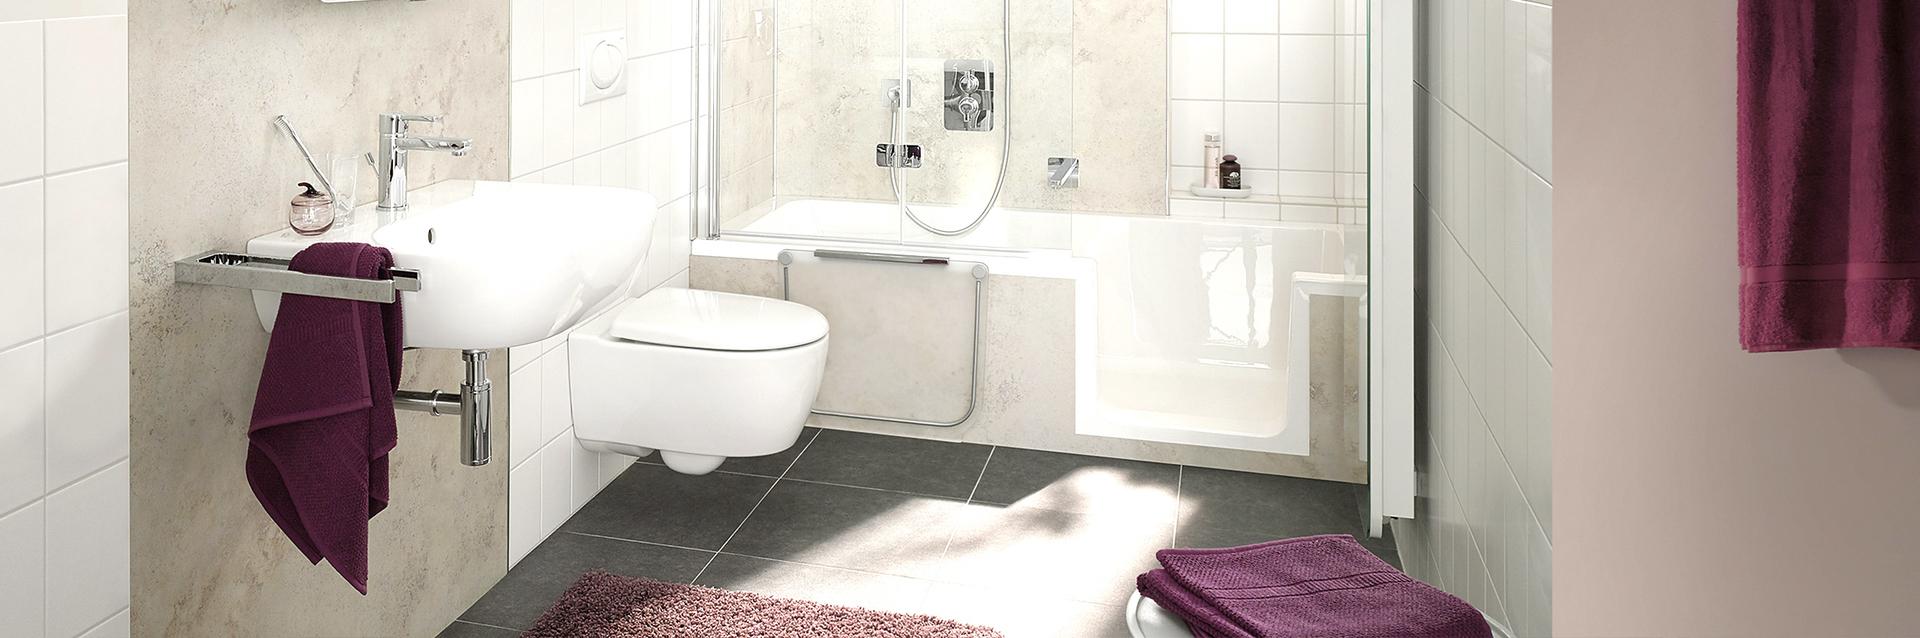 HSK Dobla: ligbad en douche in één - HSK Dobla: ligbad en douche in één